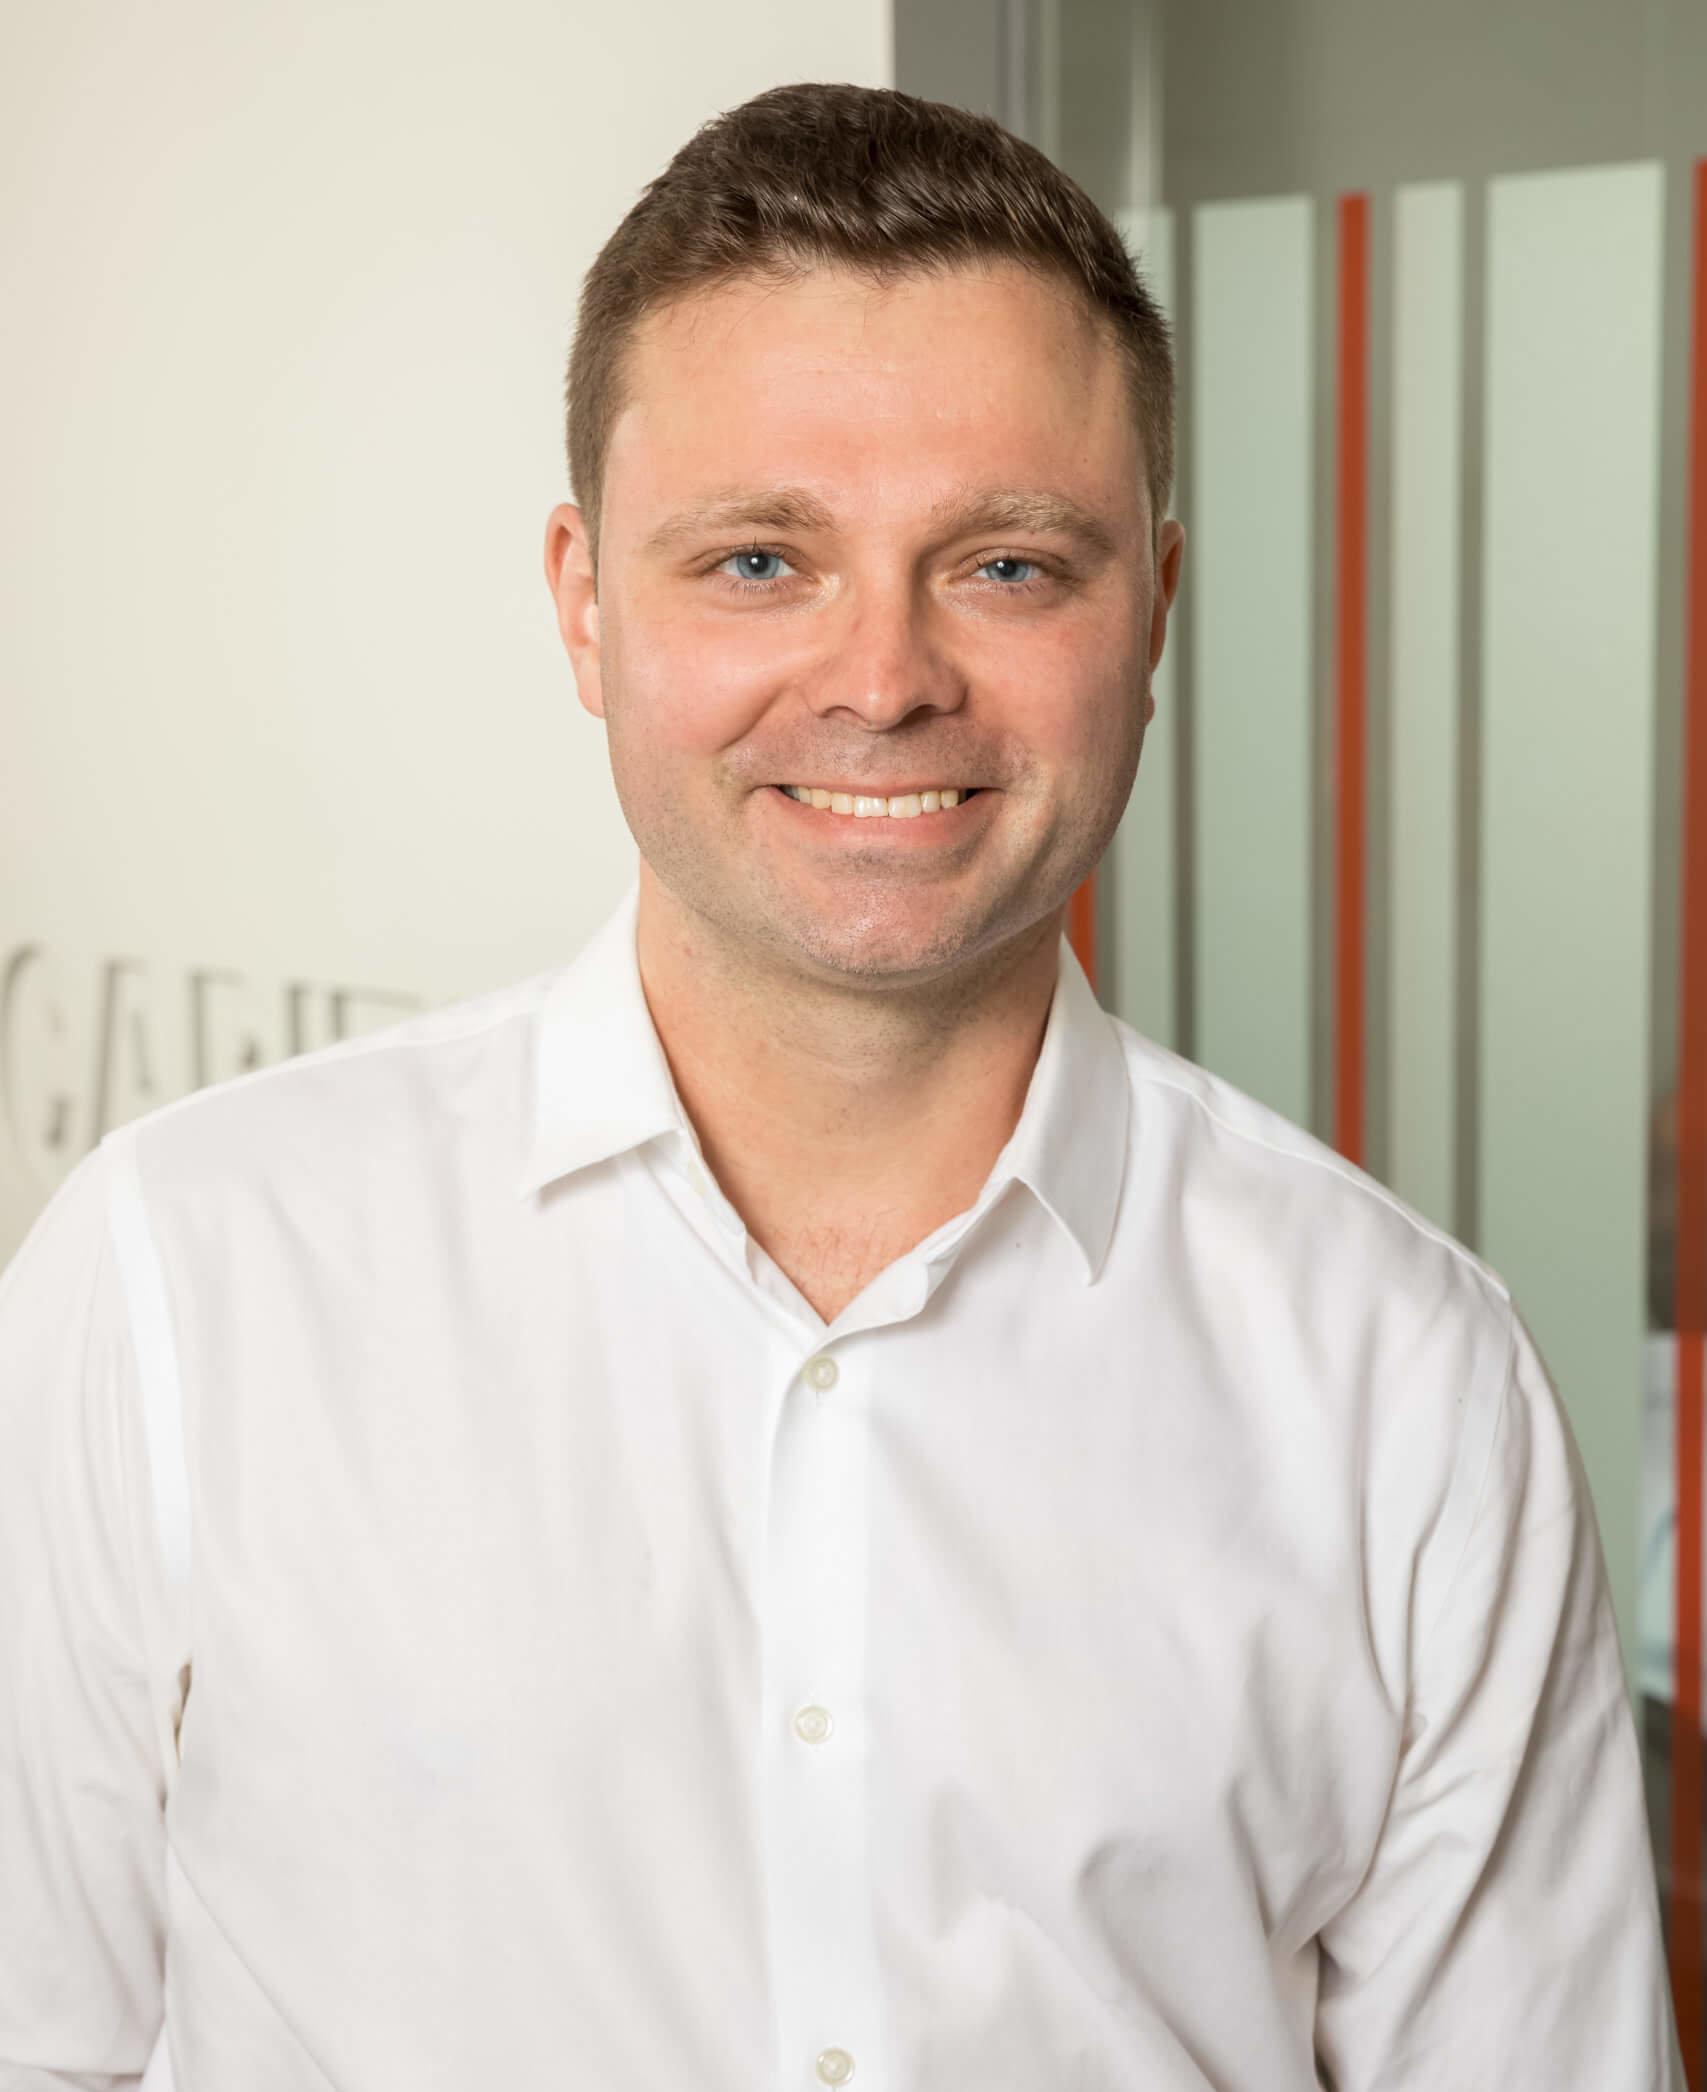 Georg Glatz